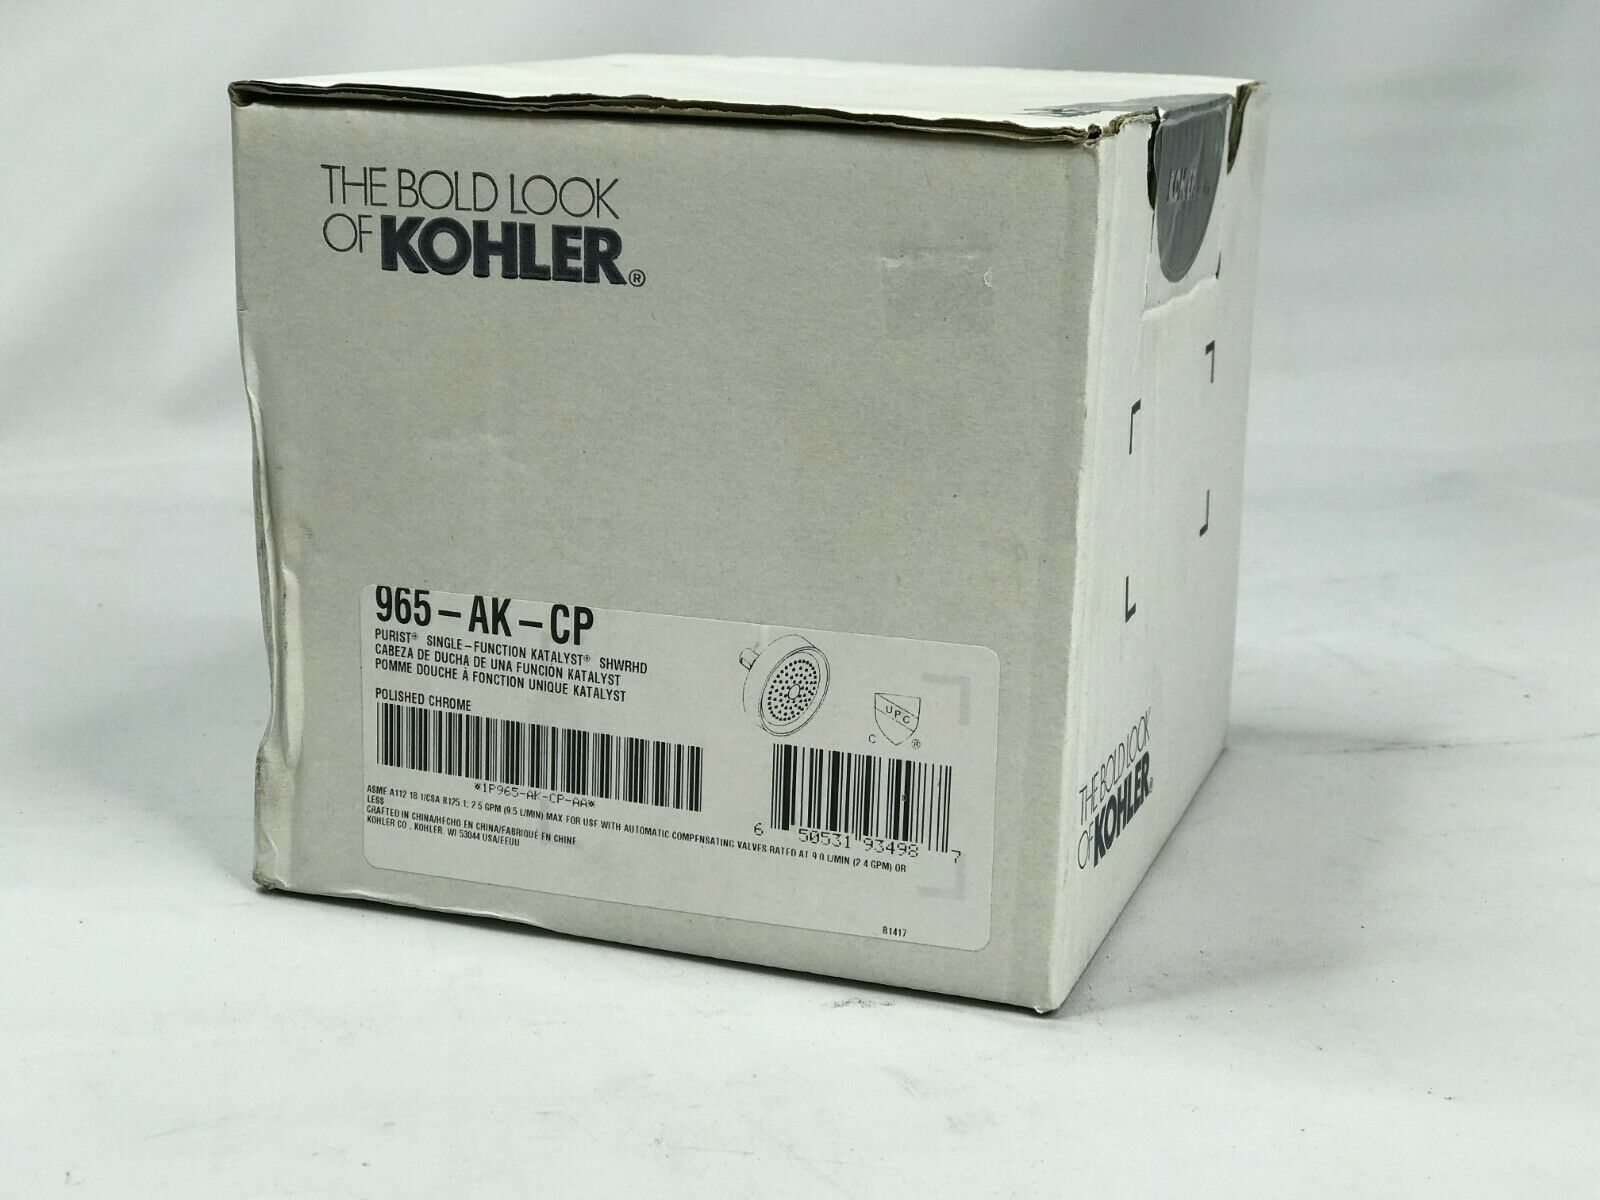 New Kohler 965 Ak Cp Purist Single Function Katalyst Showerhead Polished Chrome